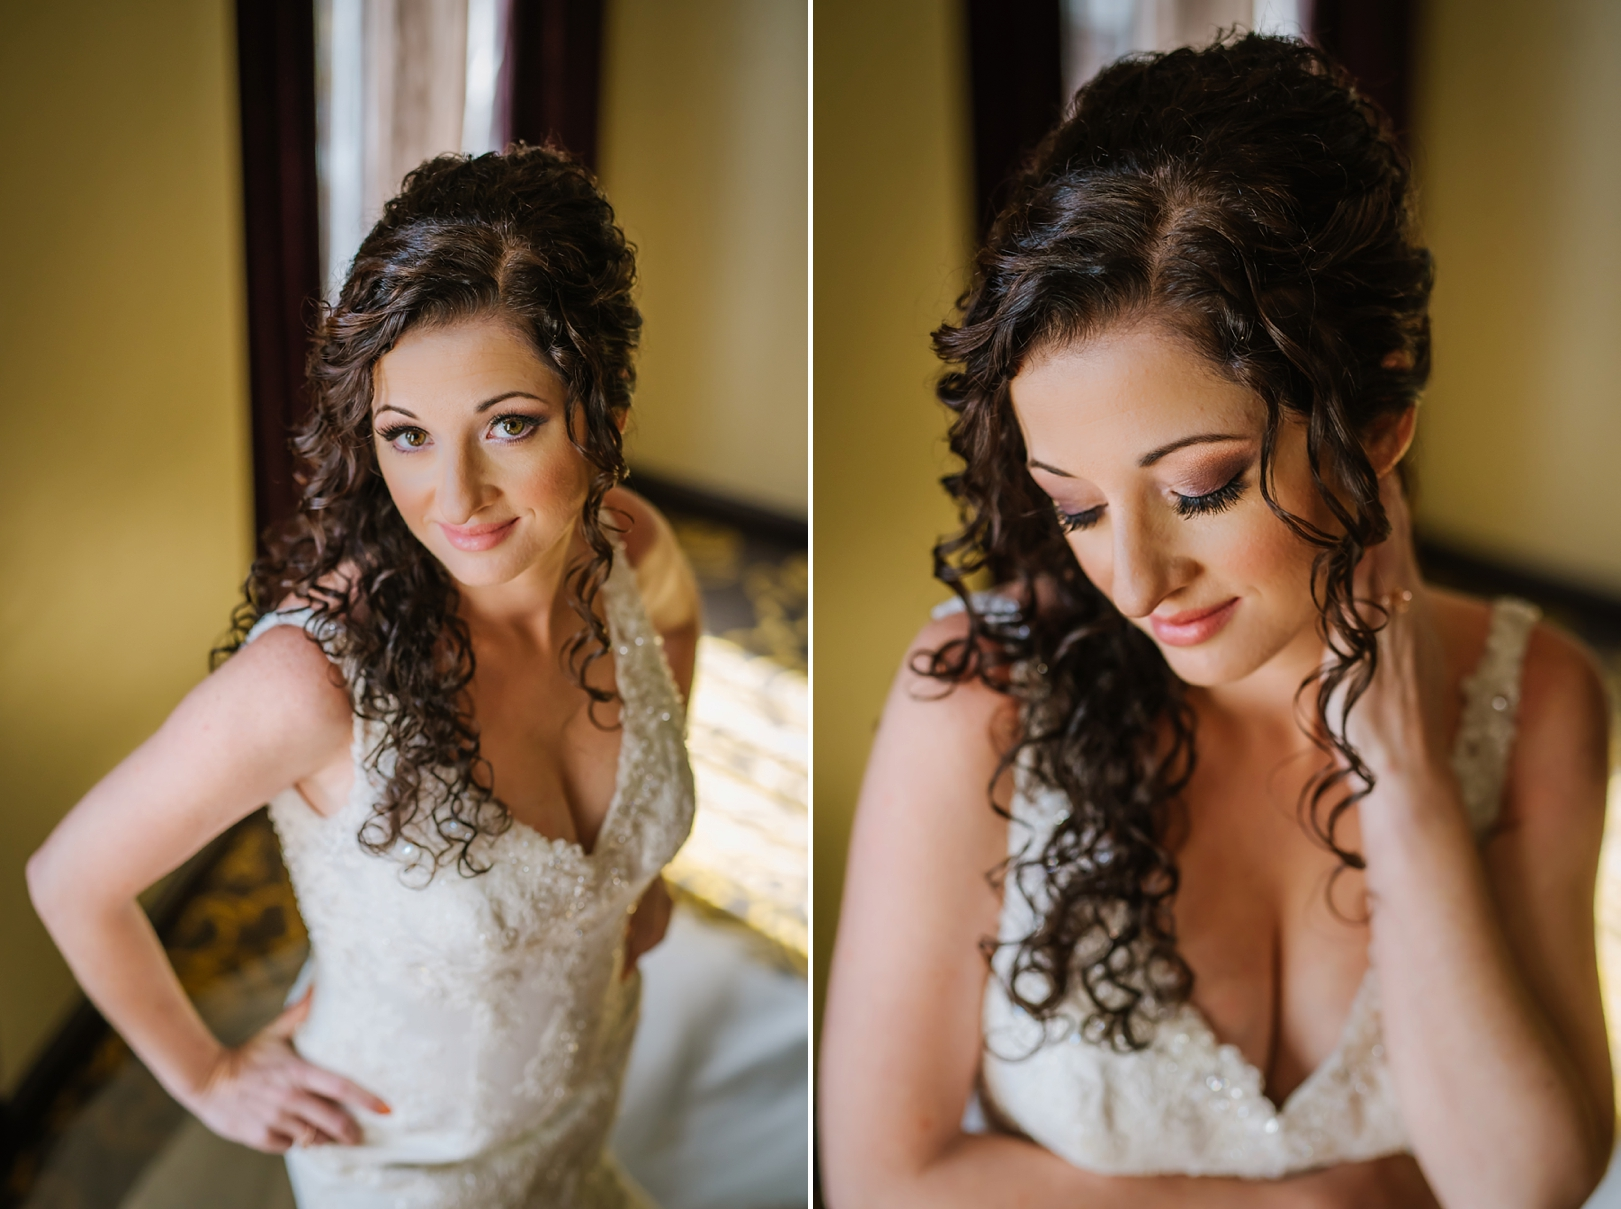 kraft-azalea-gardens-stylish-elopment-wedding-photography_0005.jpg